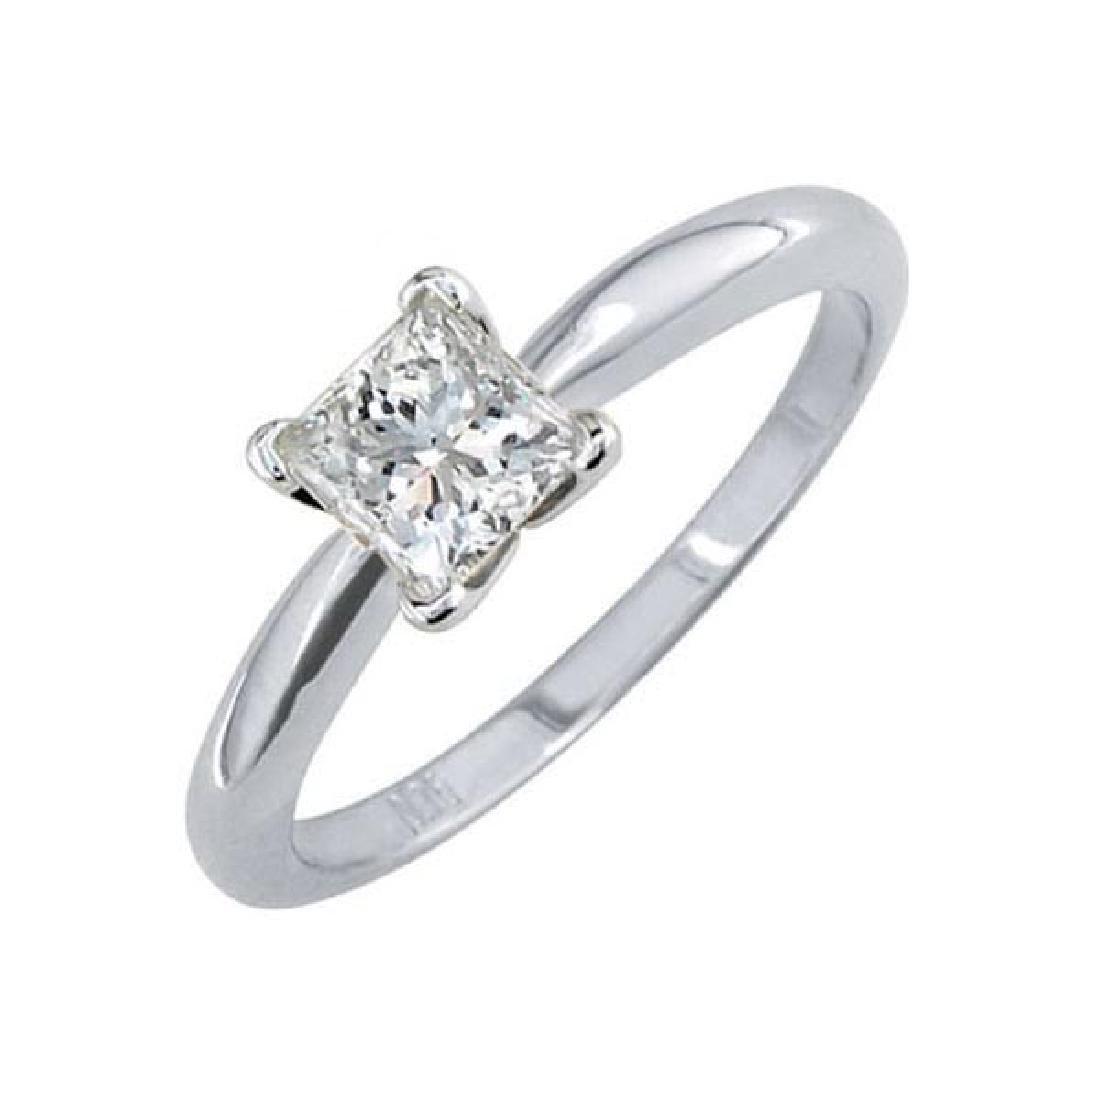 Certified 1 CTW Princess Diamond Solitaire 14k Ring G/S